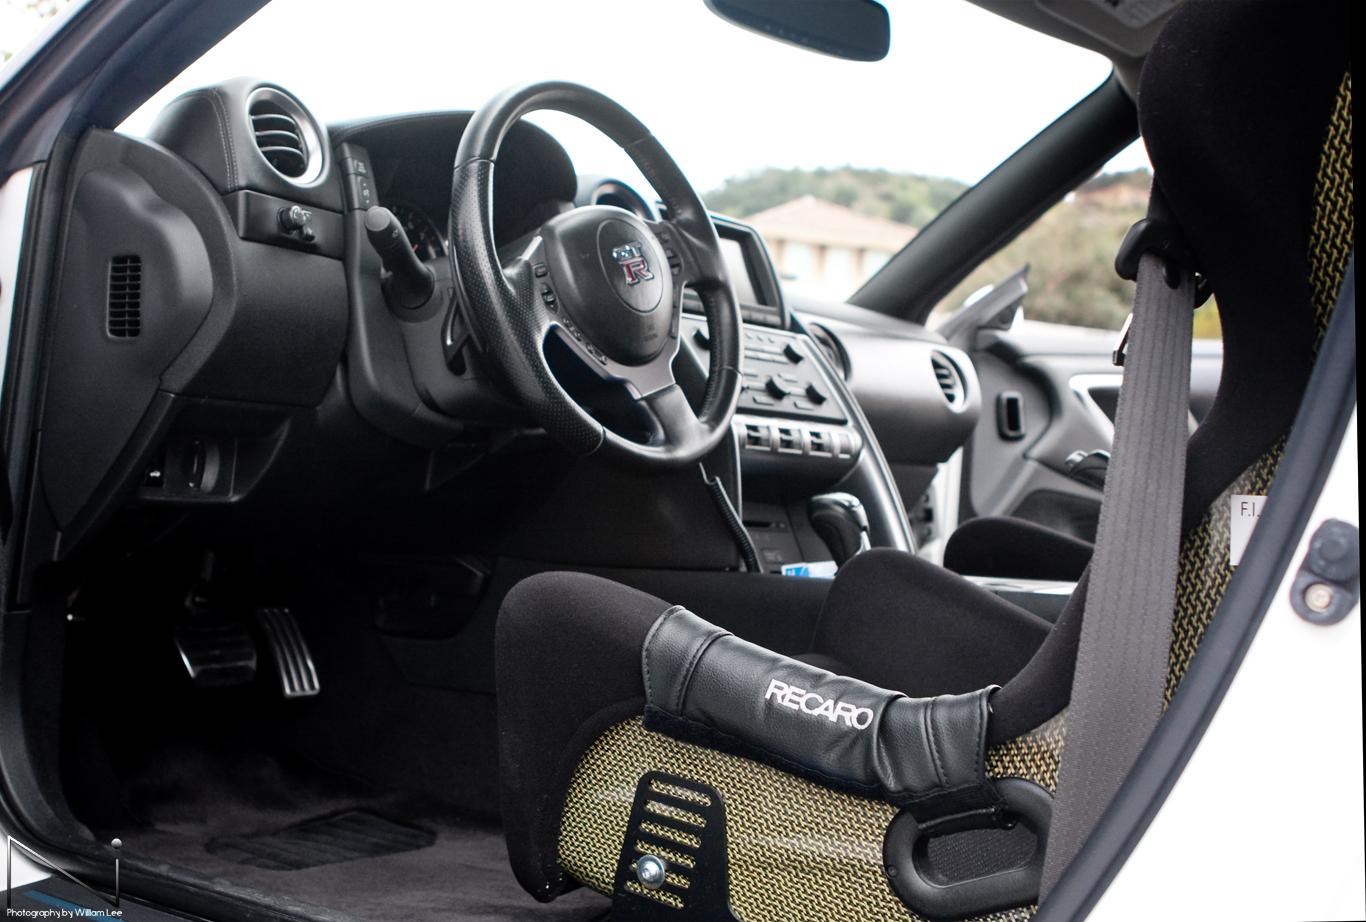 Steve's GT-R R35 Interior